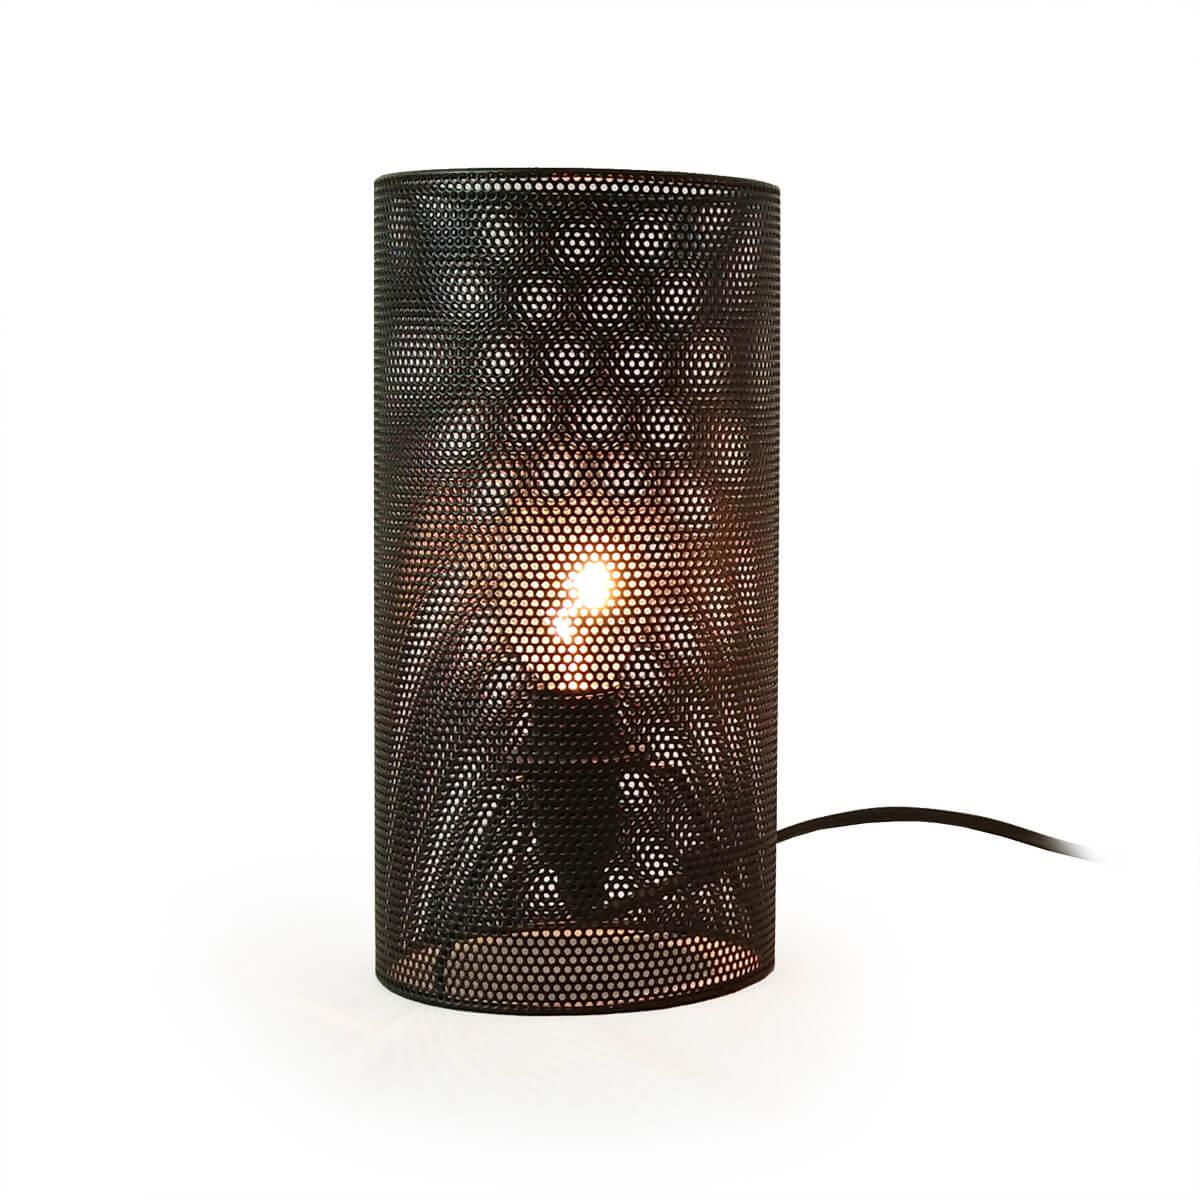 Image of: Platinet Desk Lamp 25w E27 Metal Finish Black Price Dice Bg